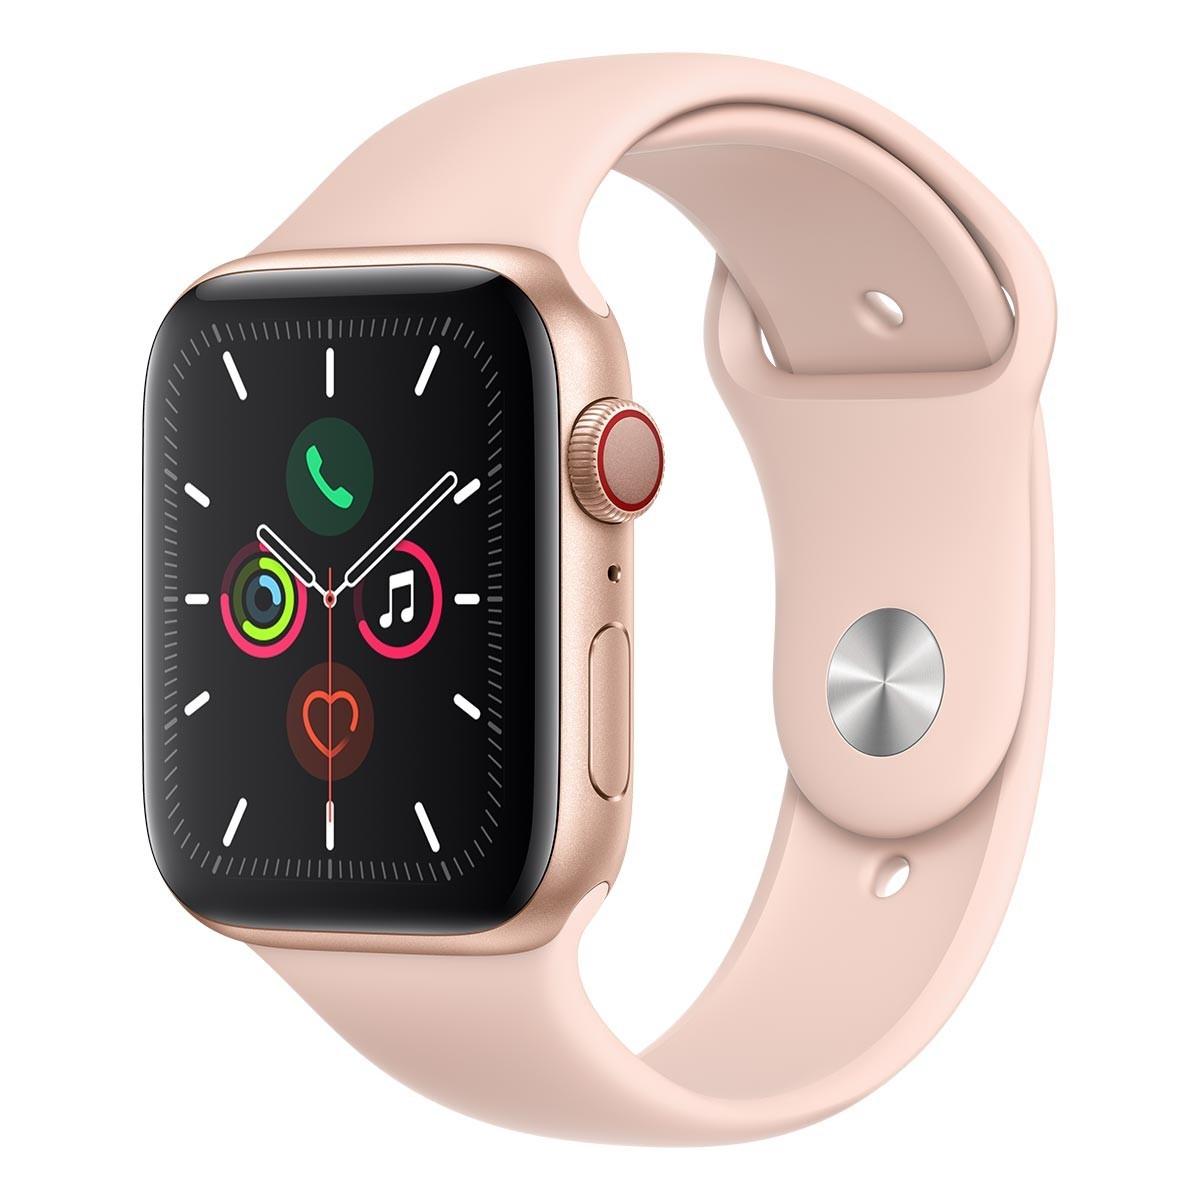 Apple Watch Series 5 (GPS + 行動網路),44 公釐金色鋁金屬錶殼搭配粉色運動型錶環